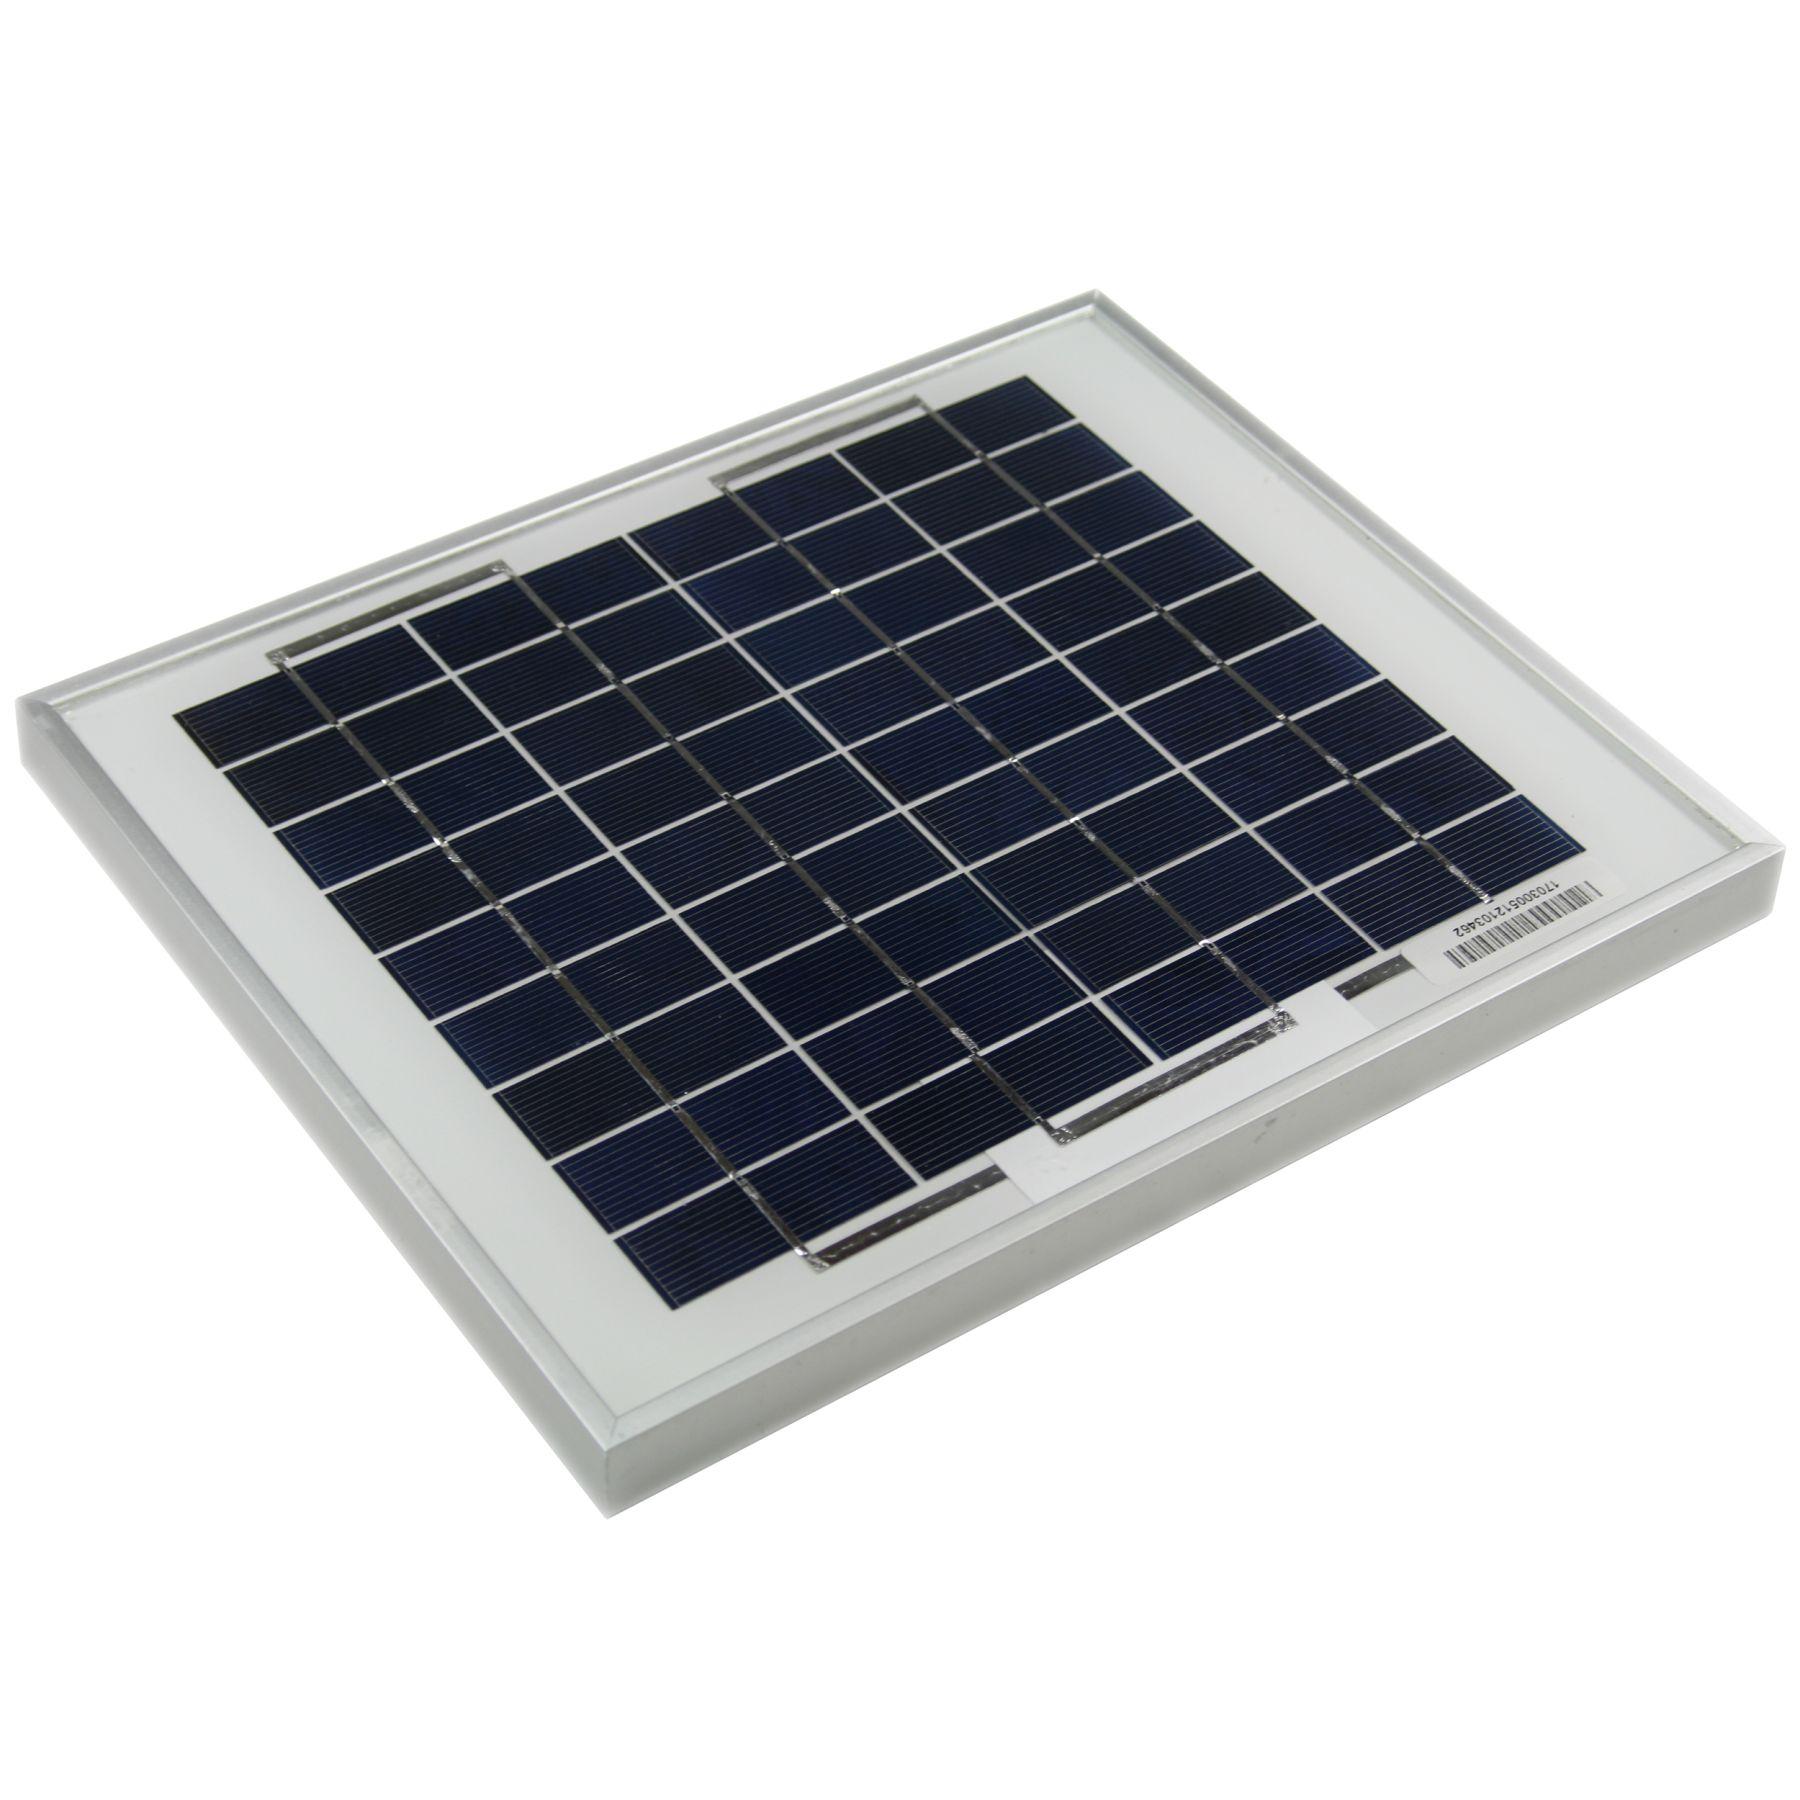 Solarland 12 V 5 Watt Solar Panel Slp005 12u W